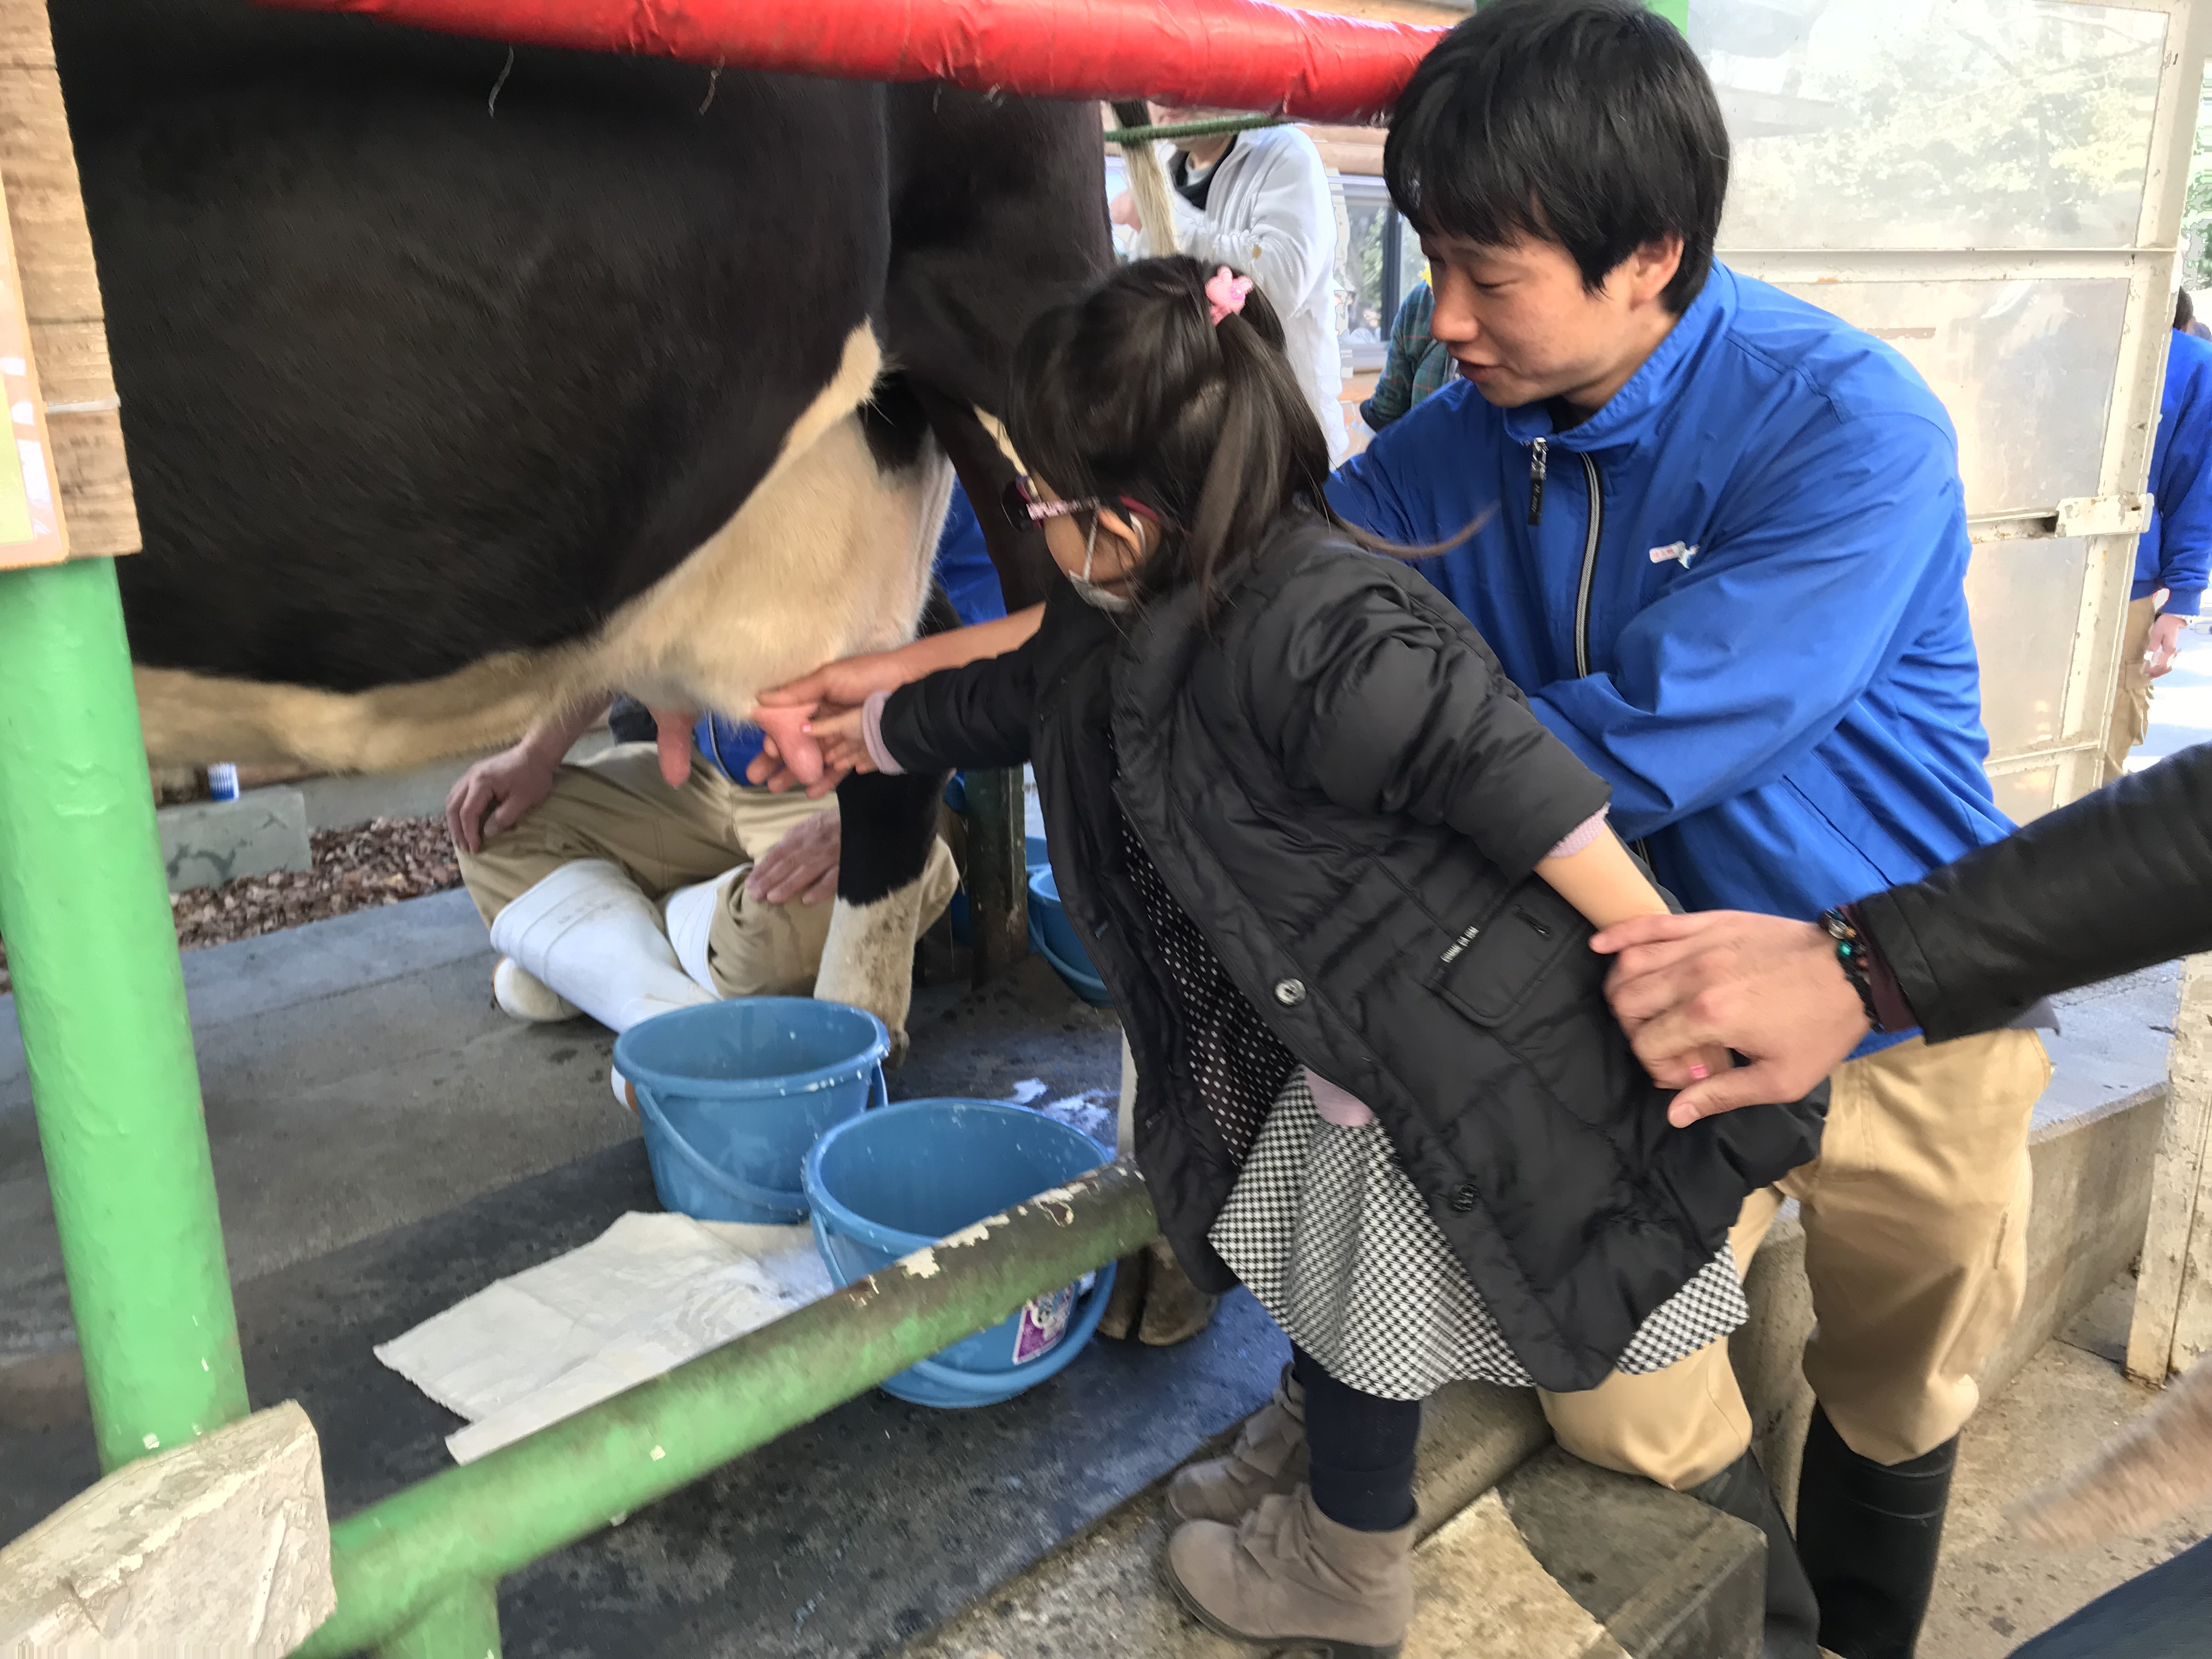 img 9317 - 子供動物自然公園 カワウソ祭りへ行ってきた